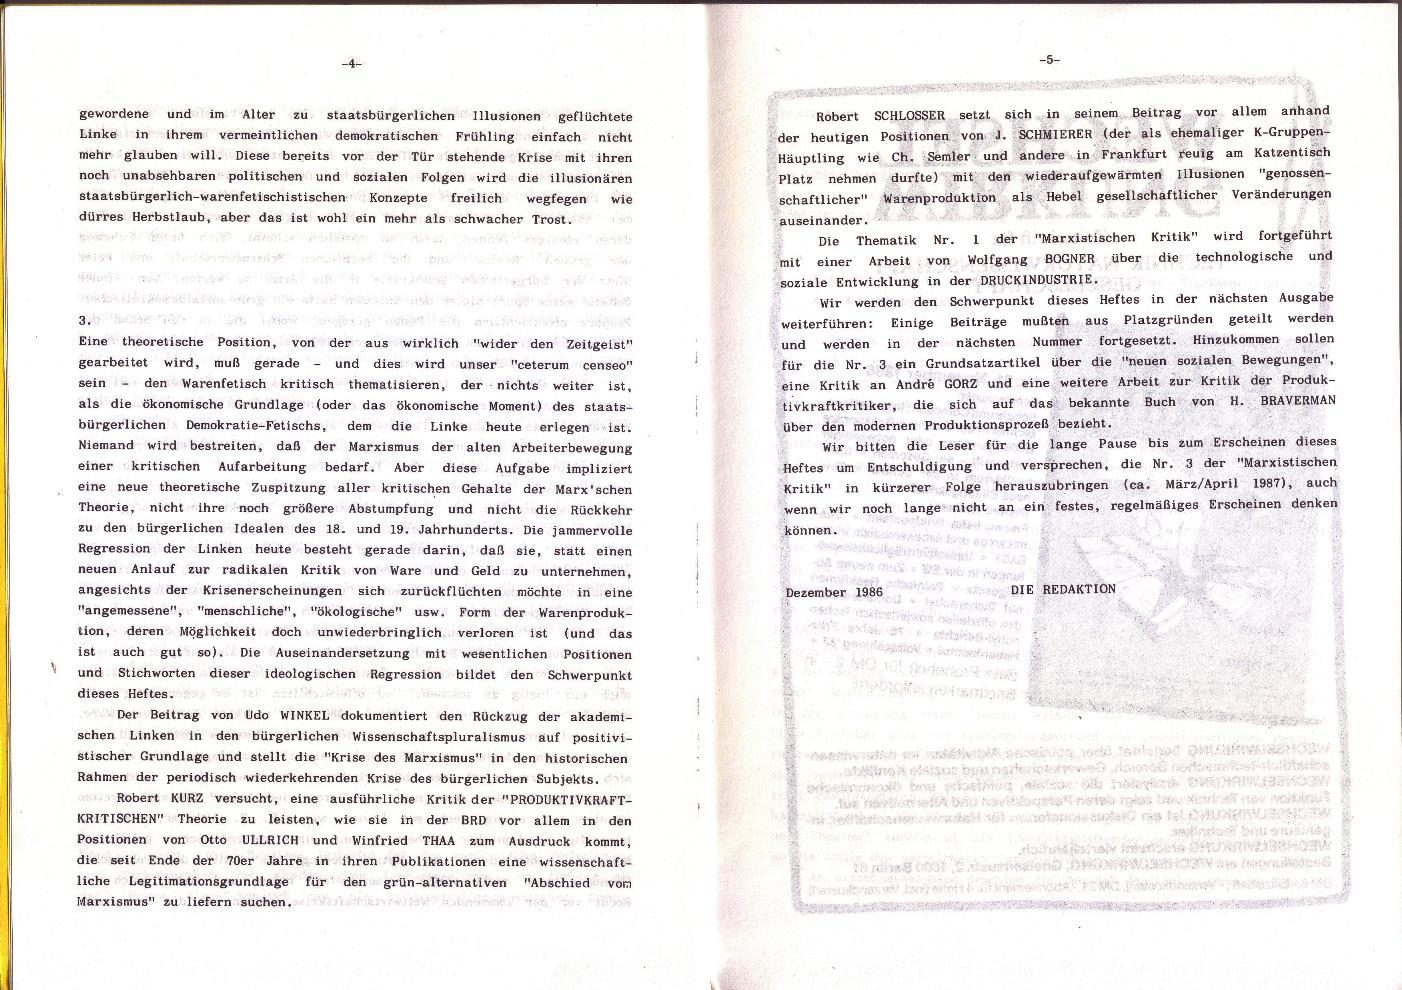 Erlangen_VMK_MK_1987_02_005